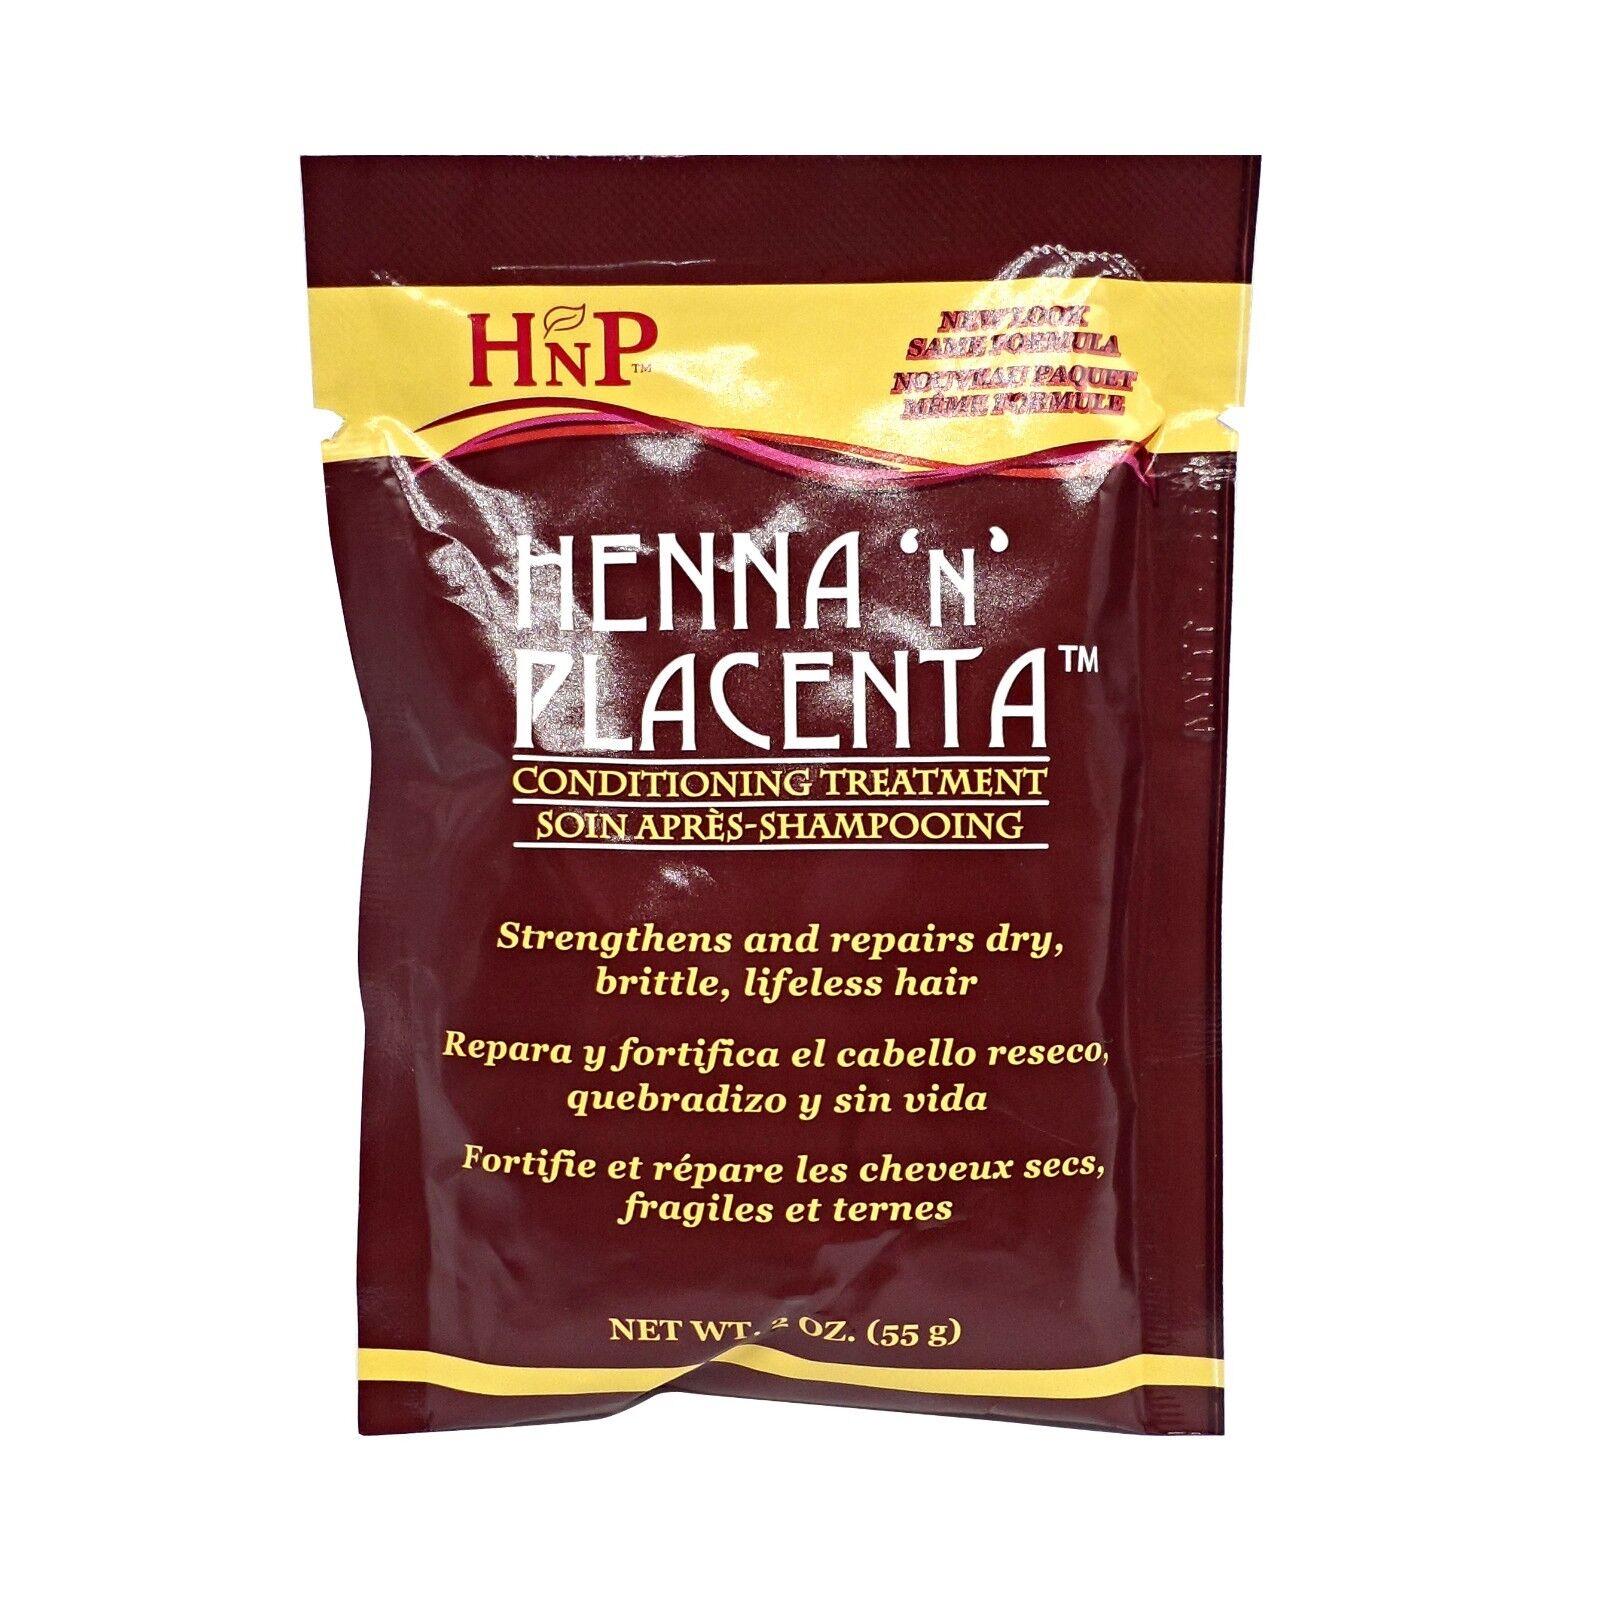 henna placenta conditioning treatment